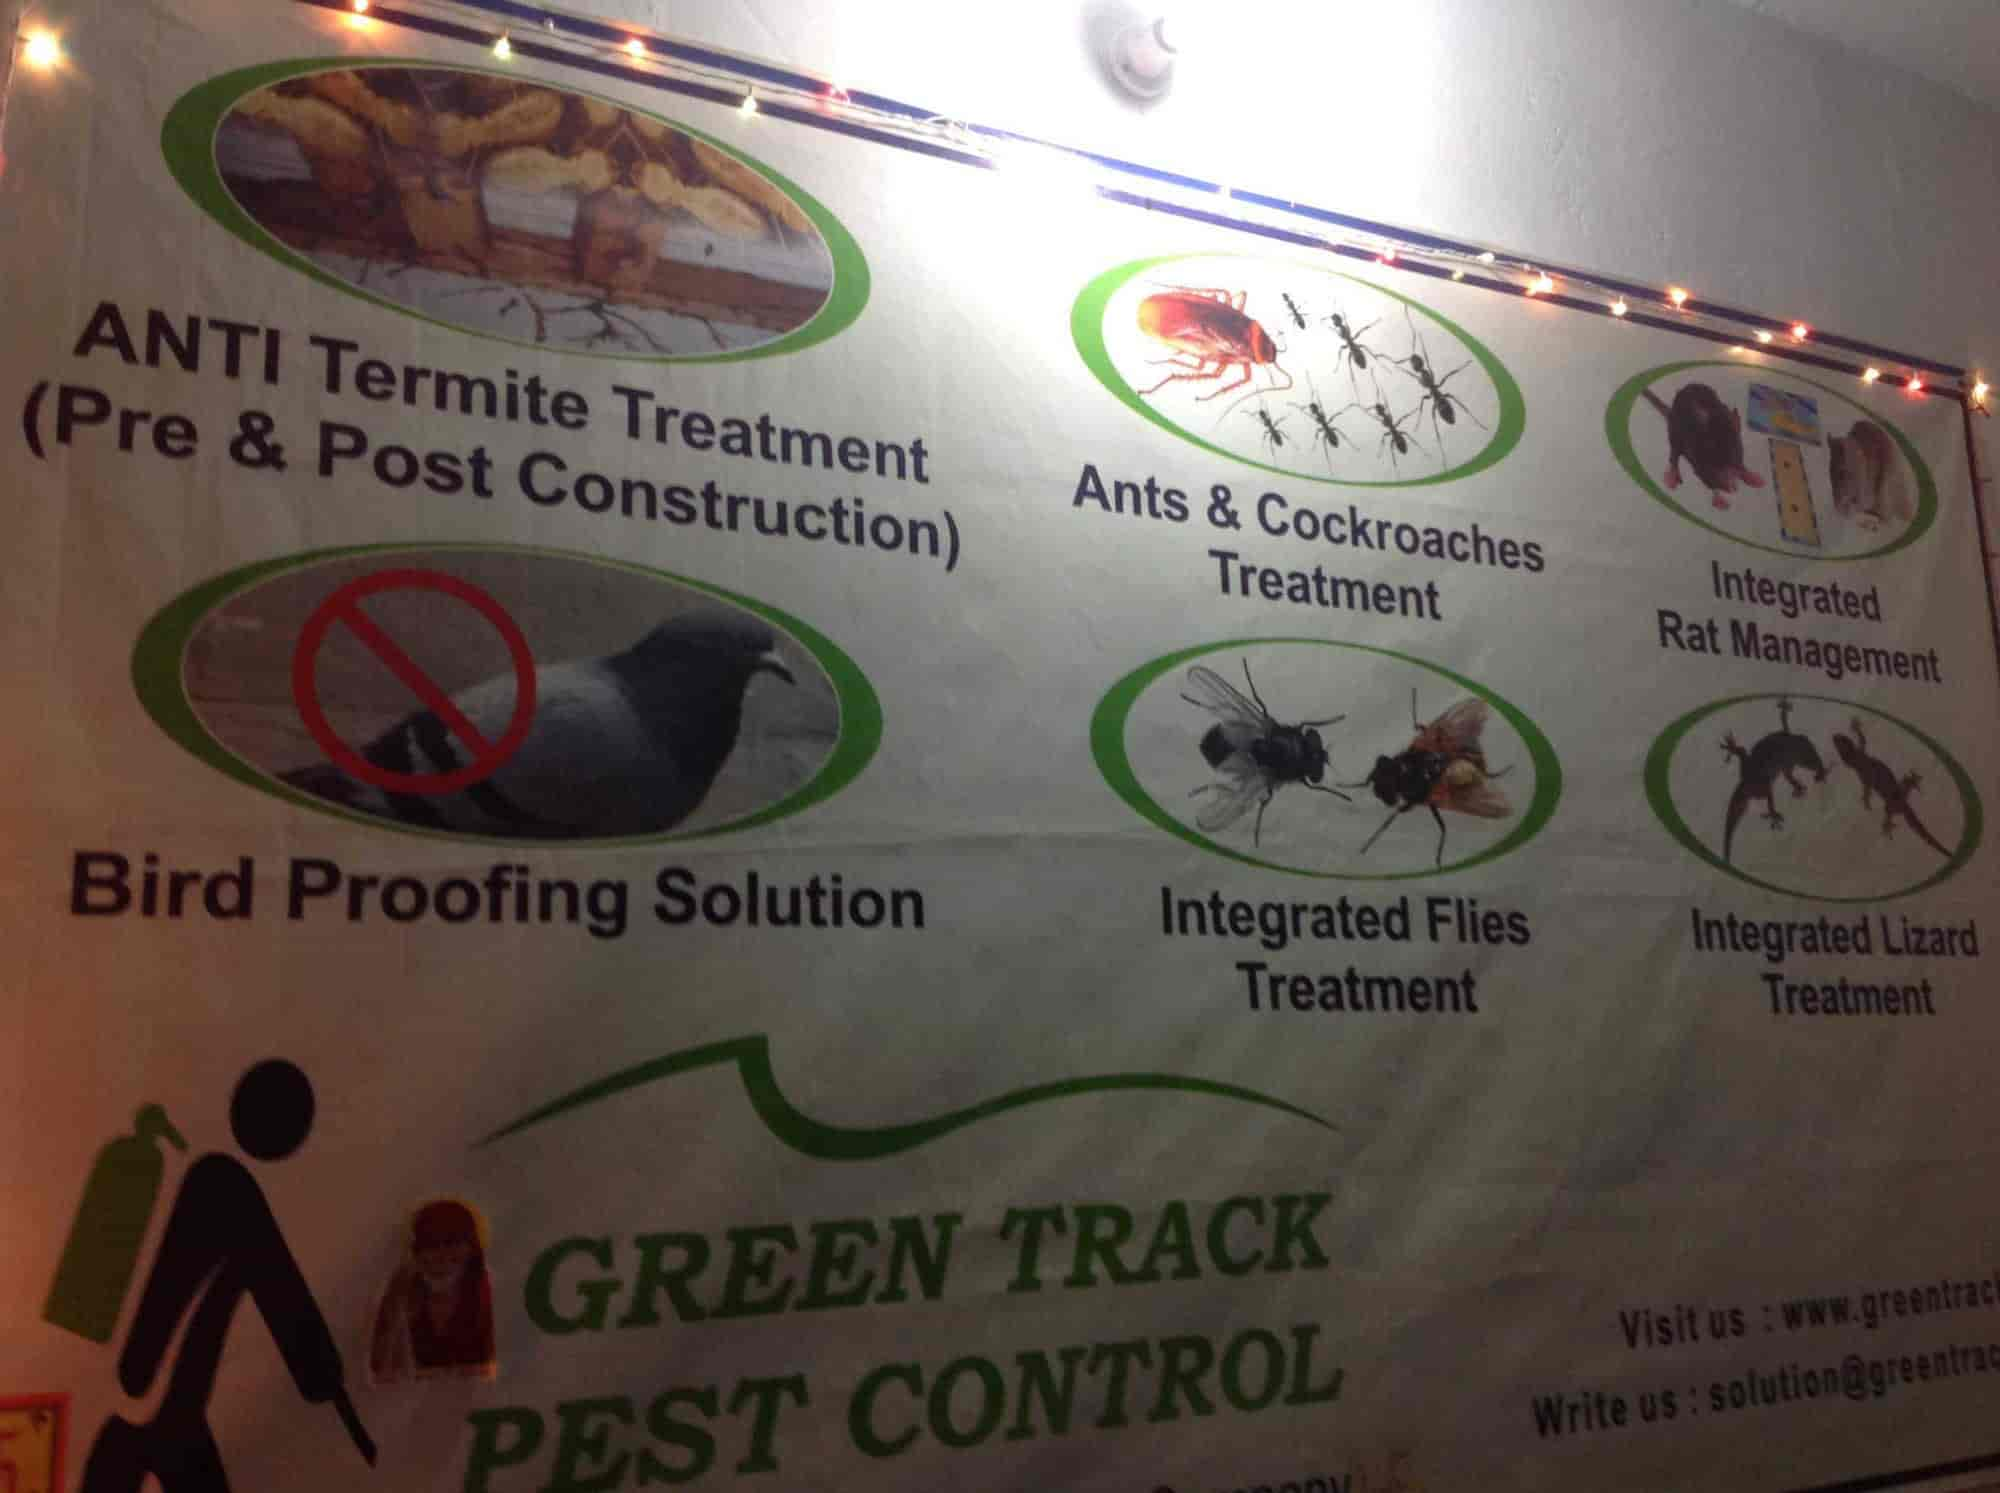 Green Track Pest Control Photos, Kidwai Nagar, Kanpur- Pictures